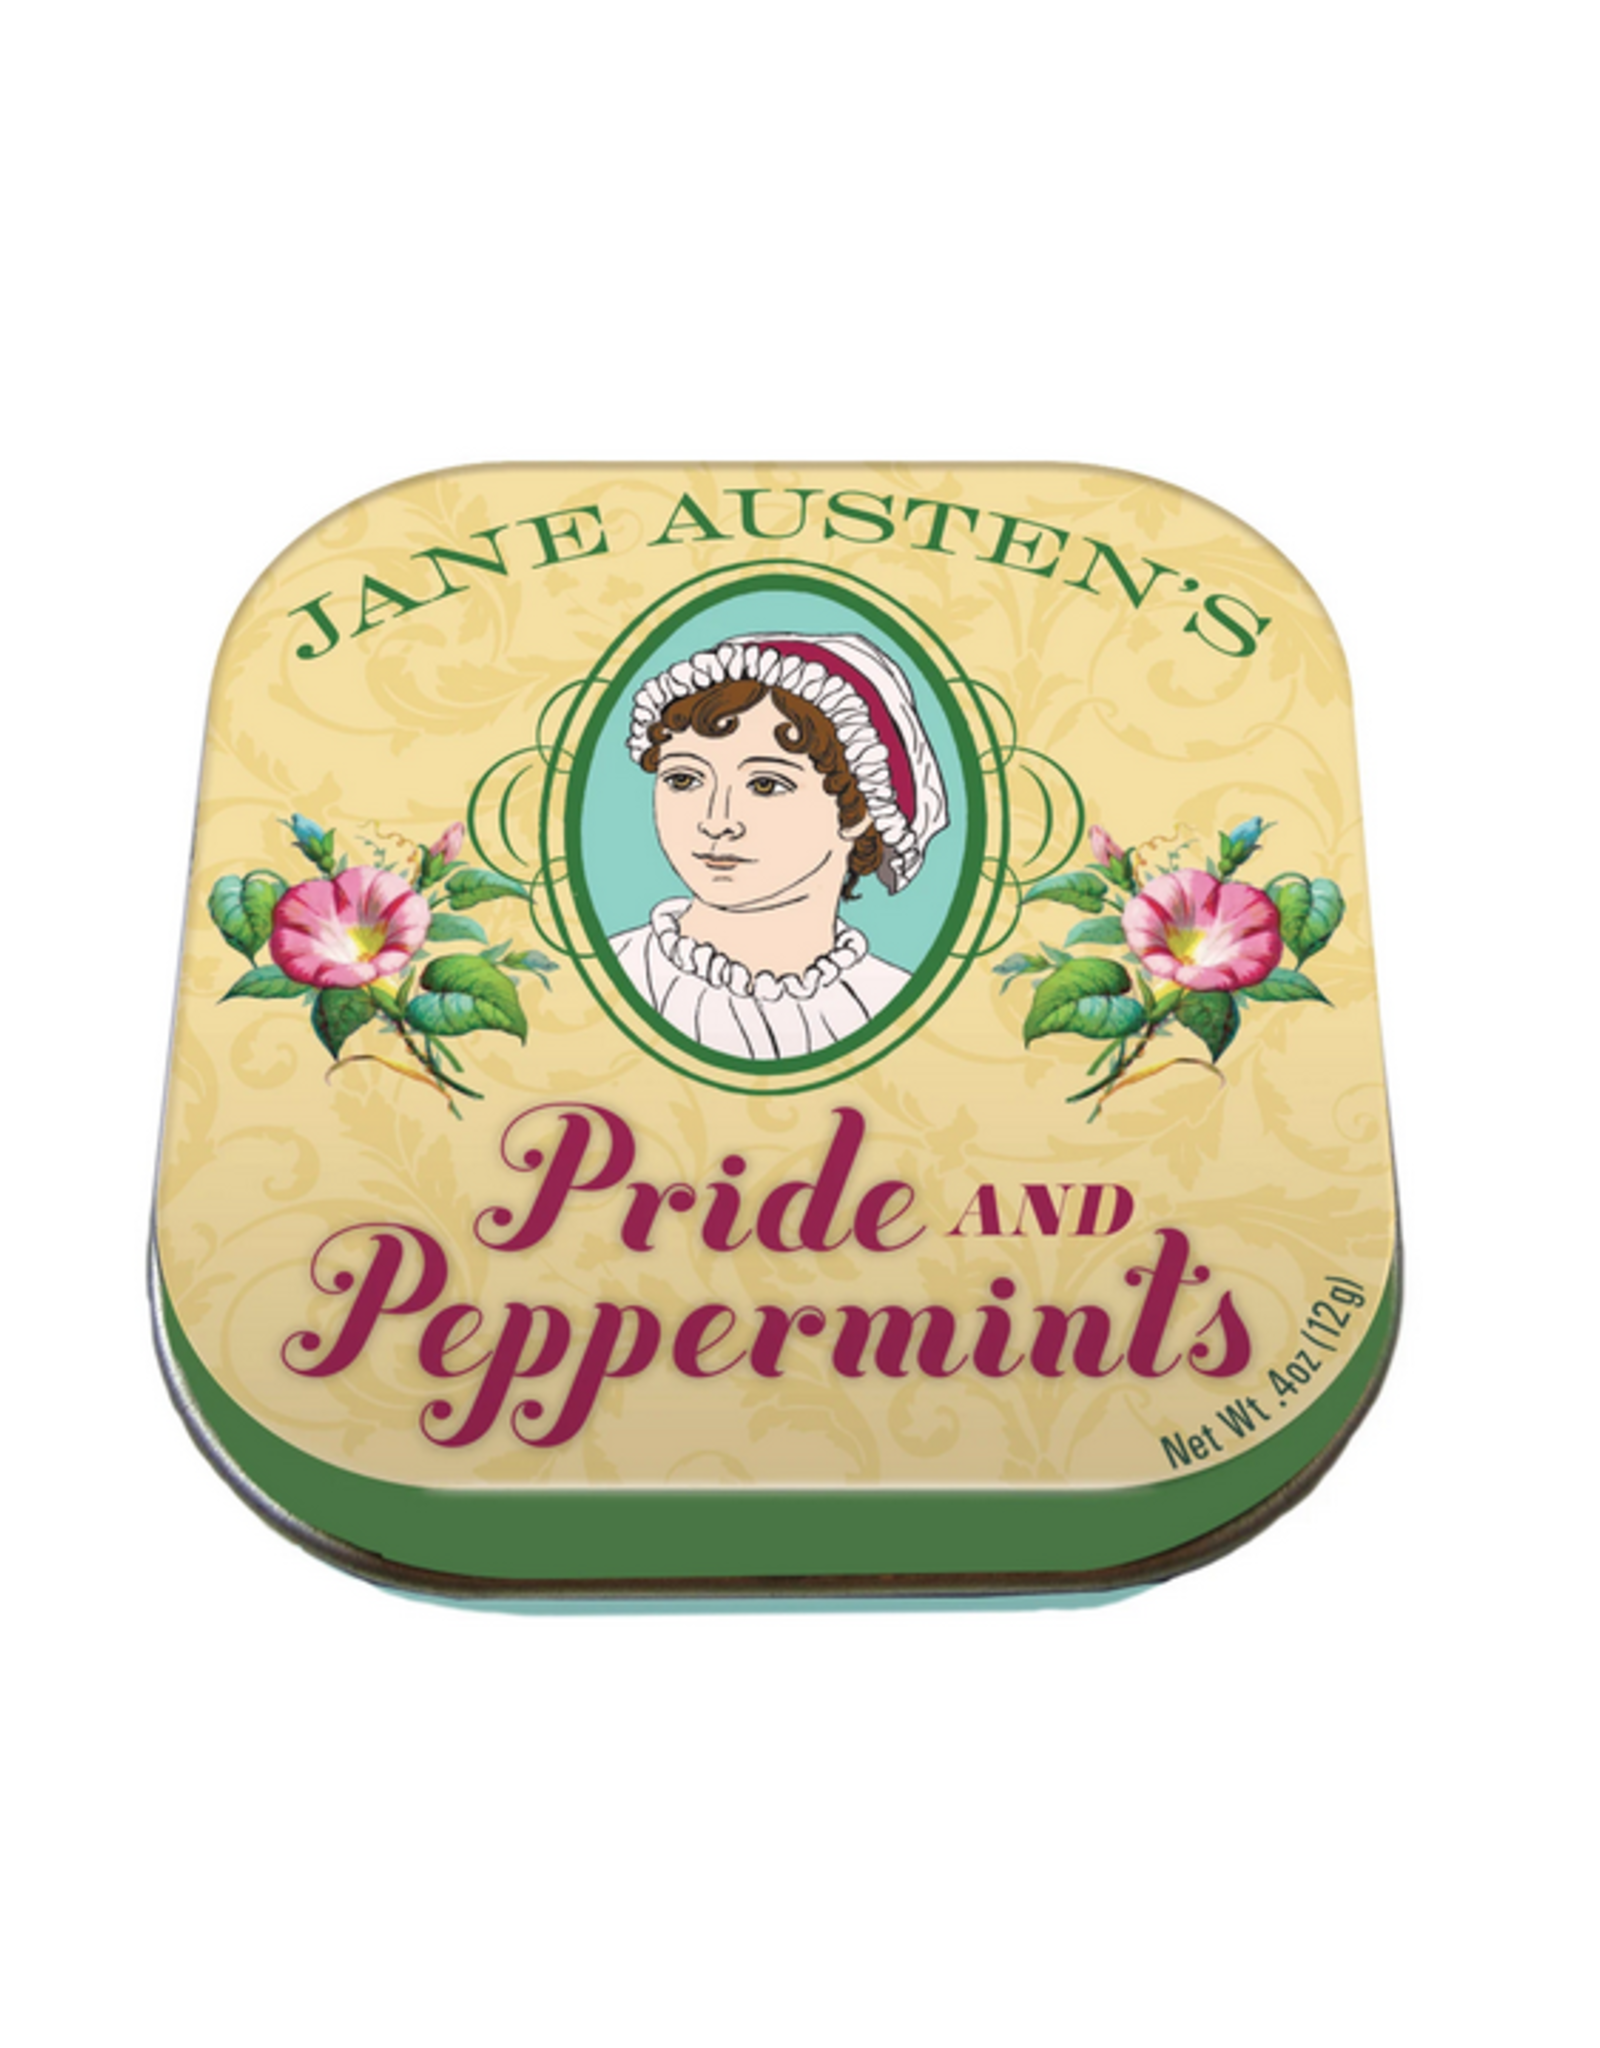 Jane Austen Mints